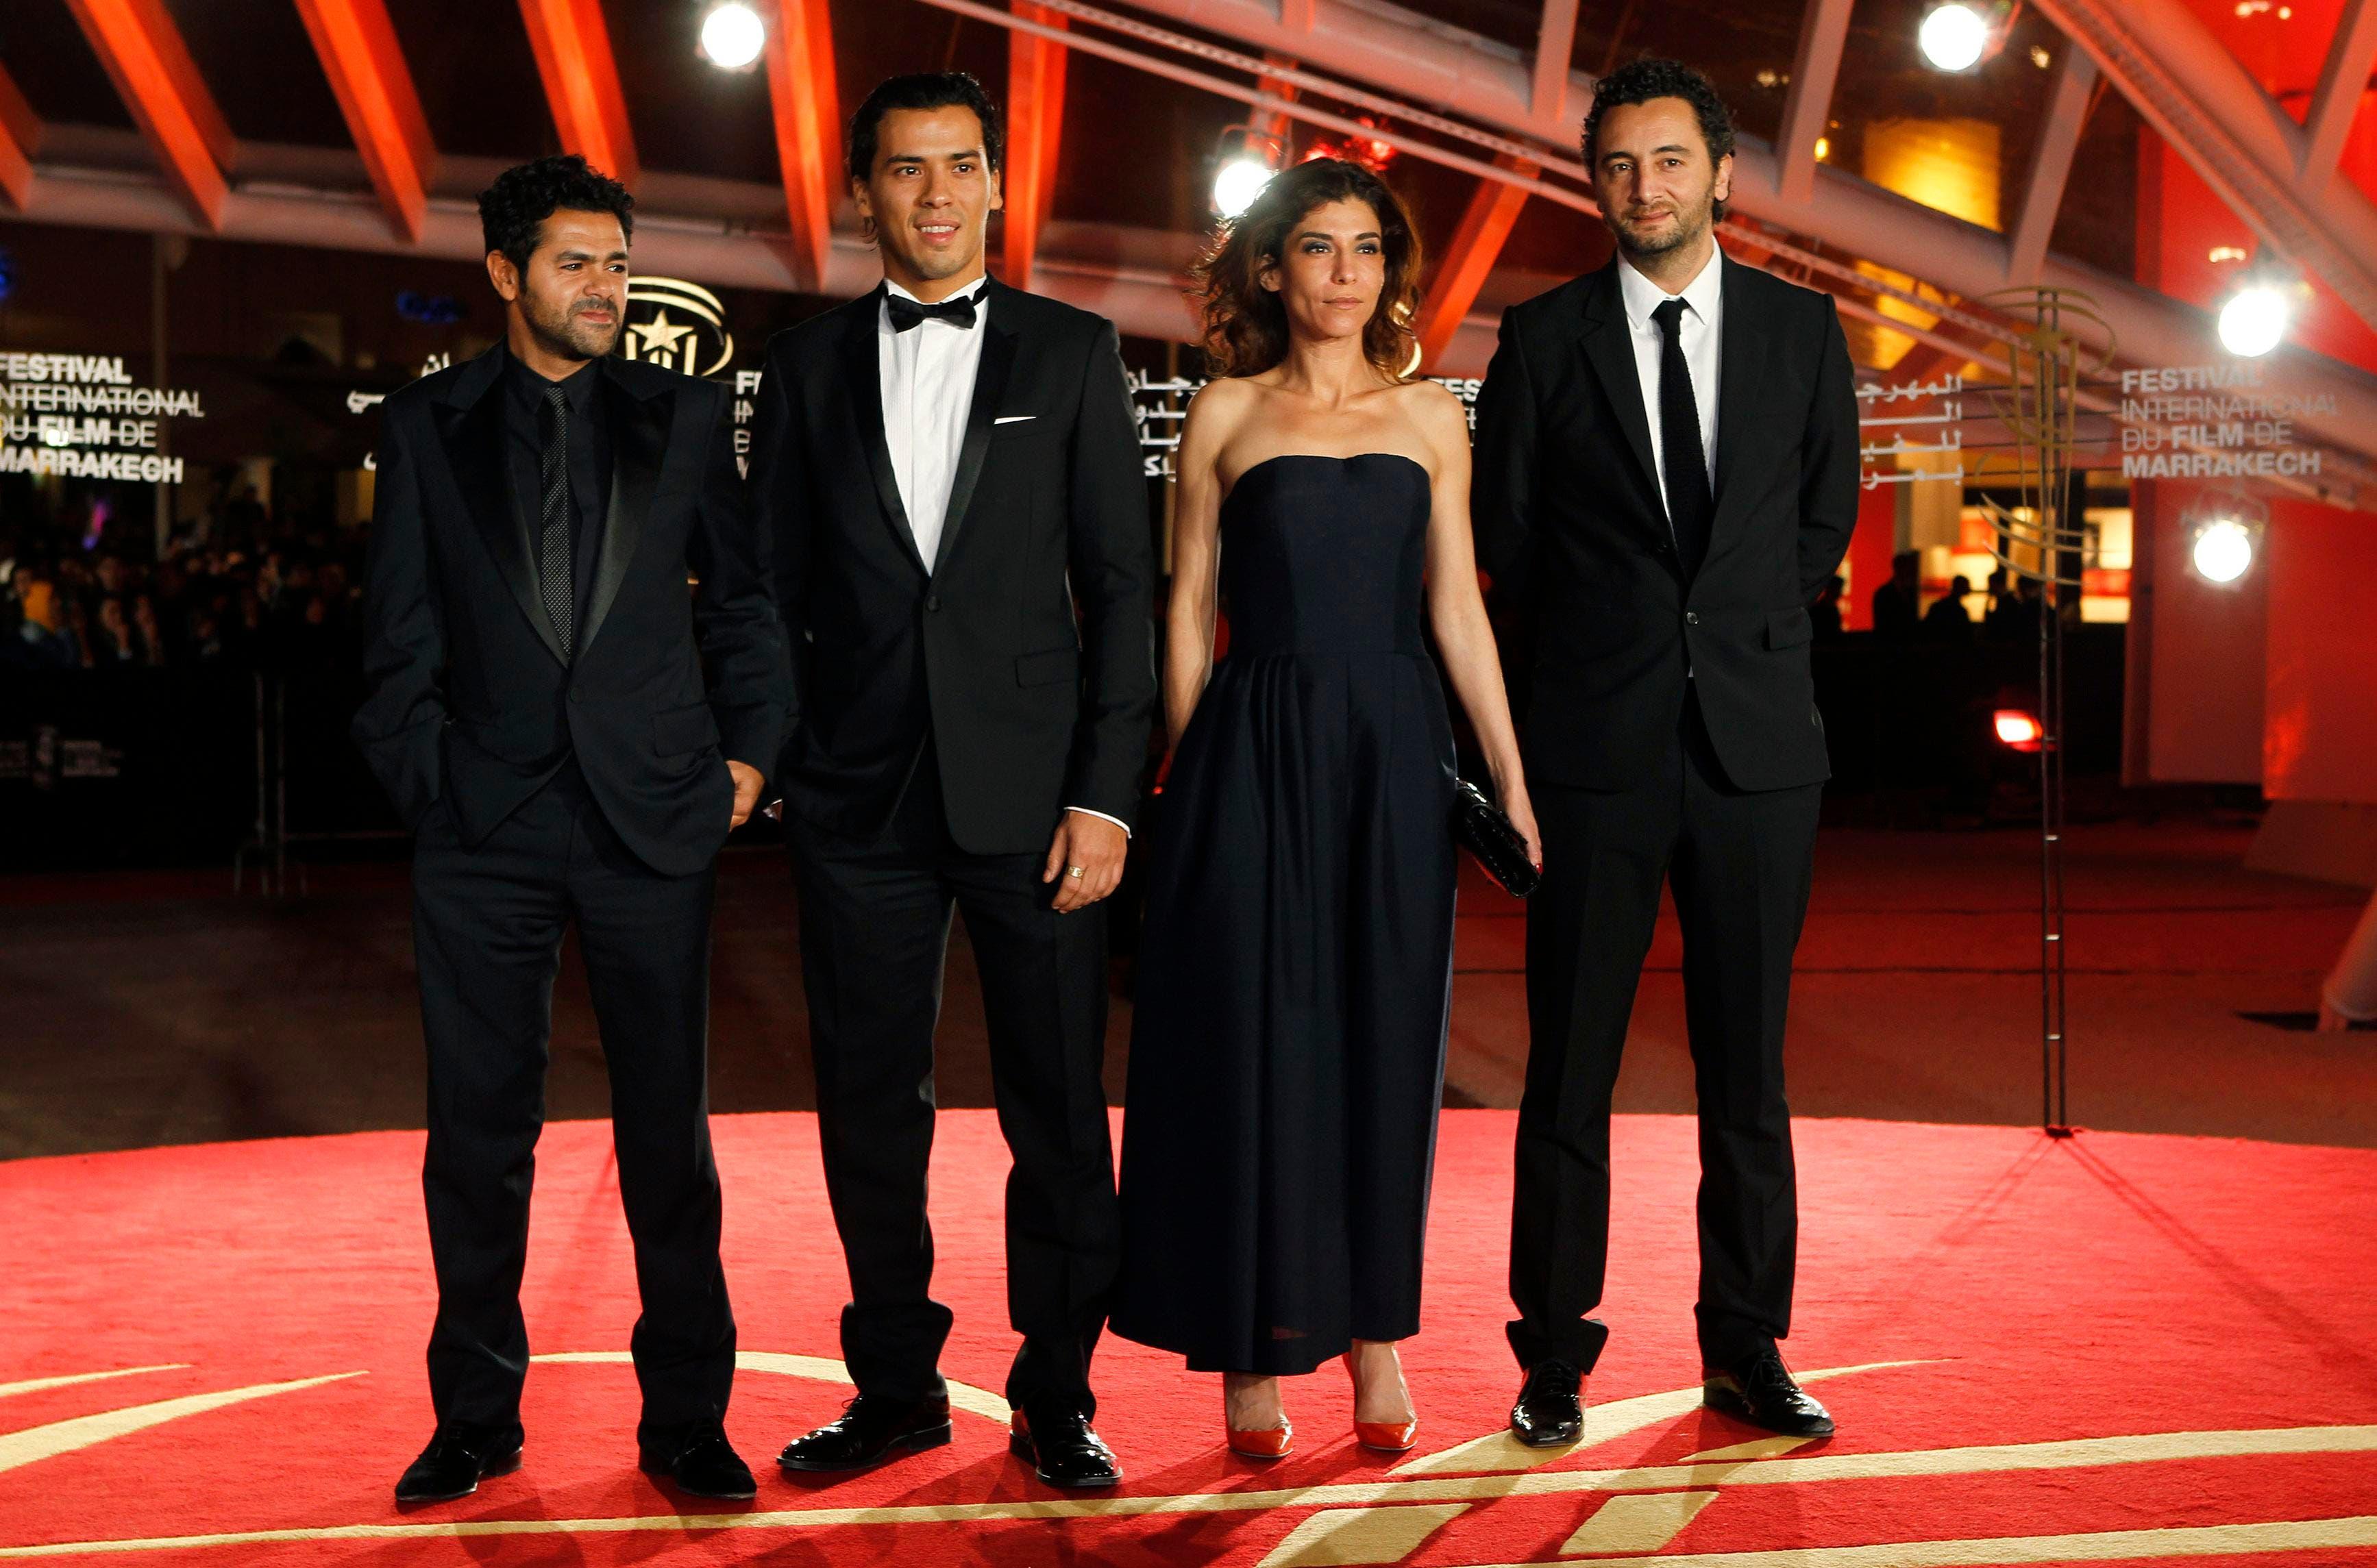 Marrakech International Film Festival